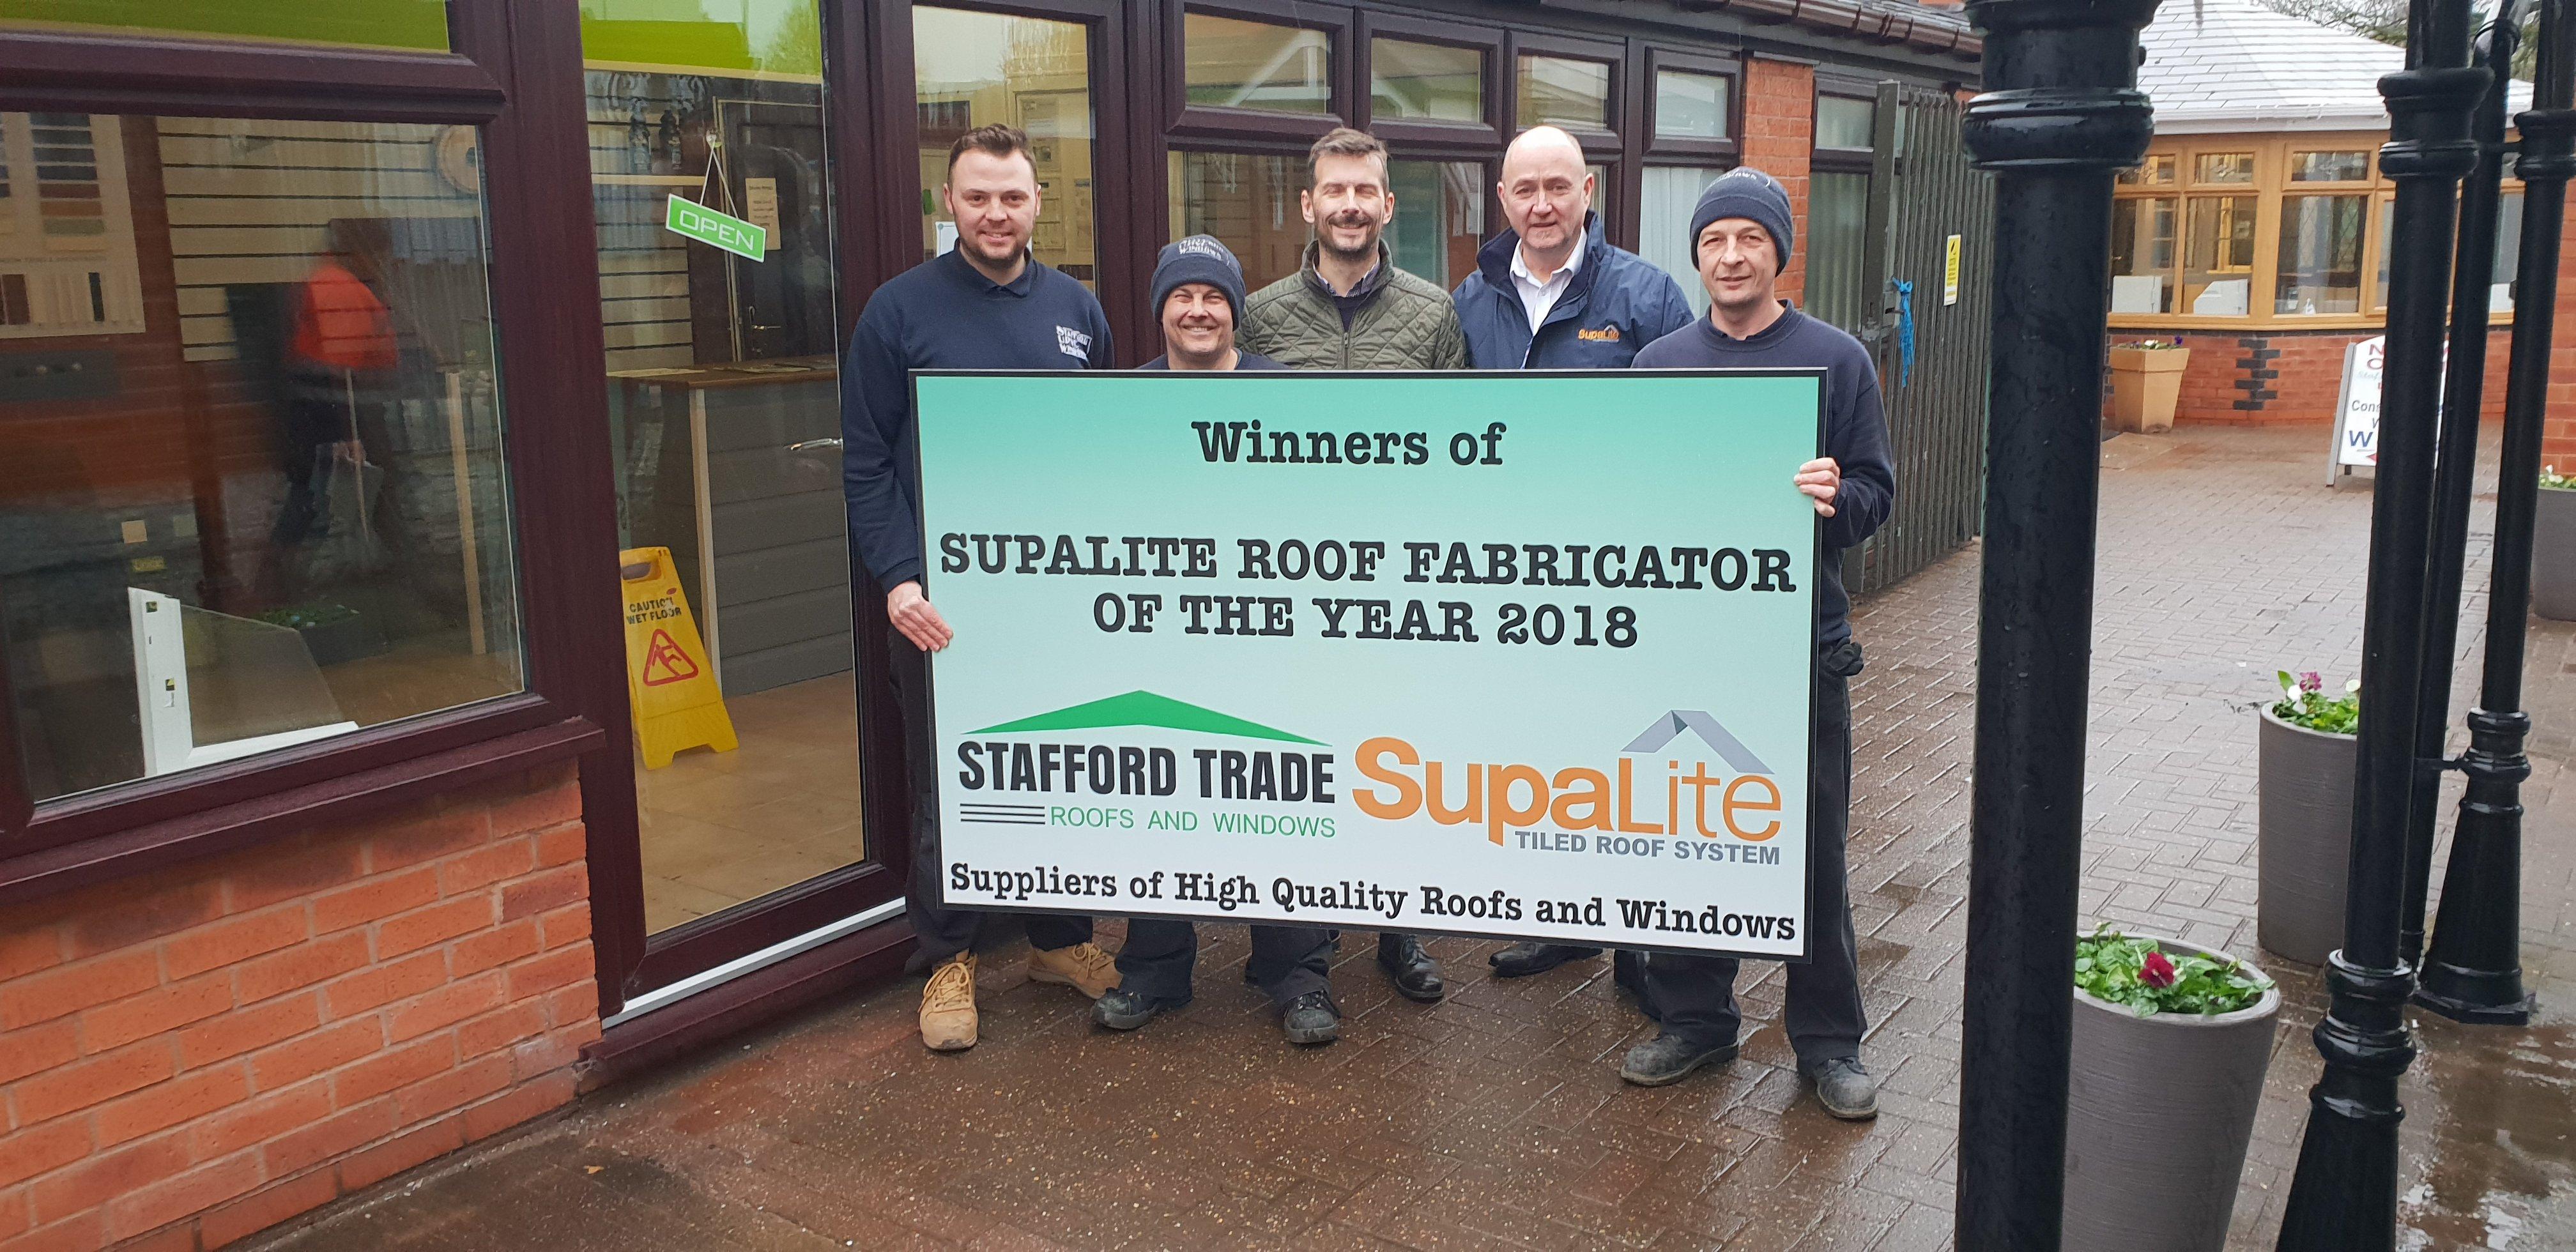 SupaLite Roof Fabricator of the Year 2018